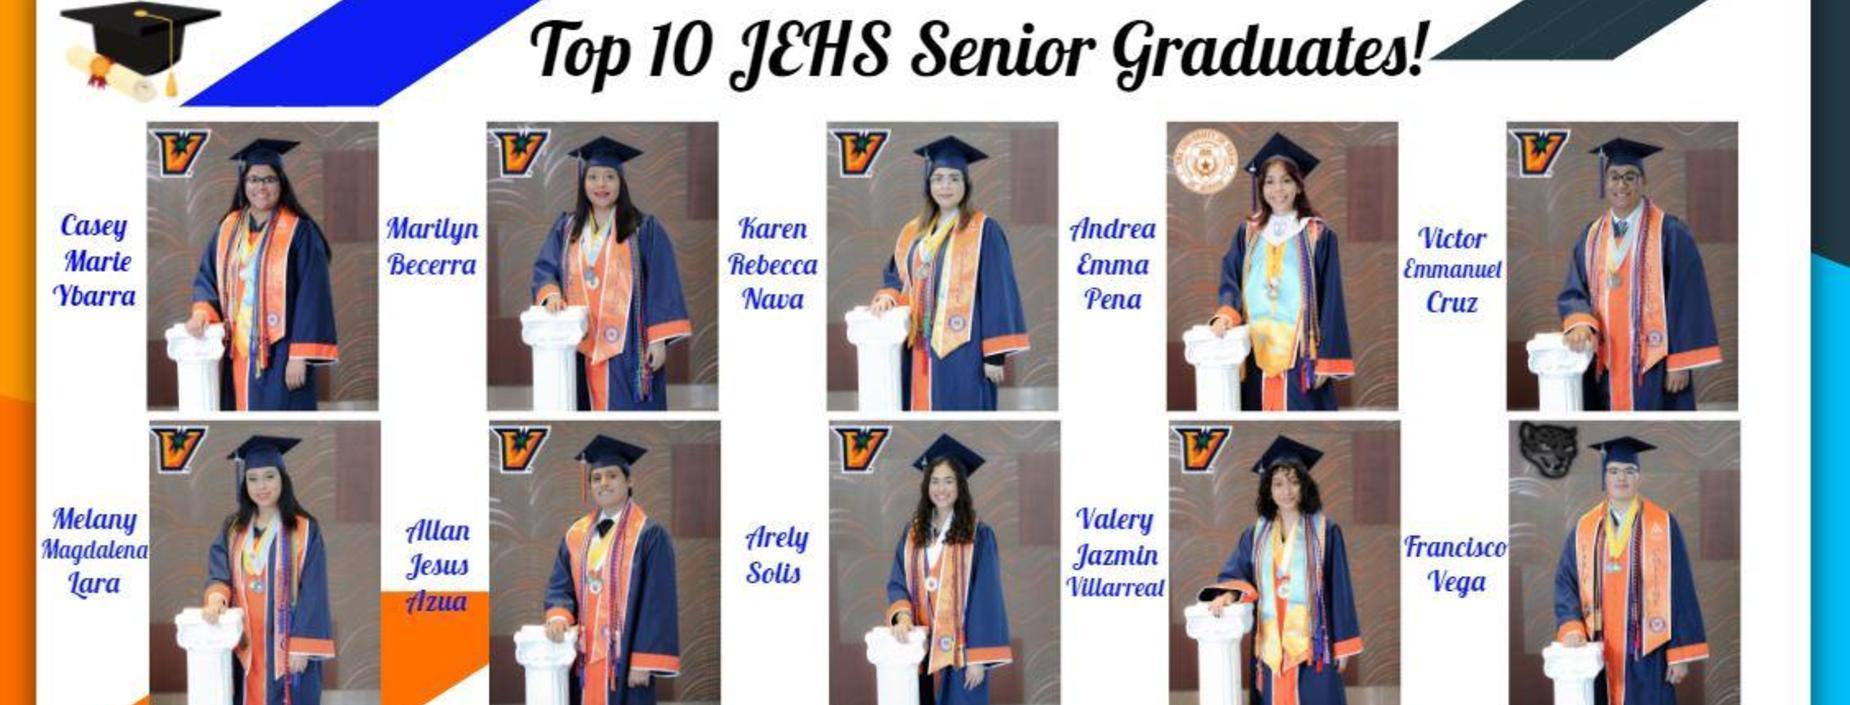 JEHS TOP 10 GRADUATES 2021